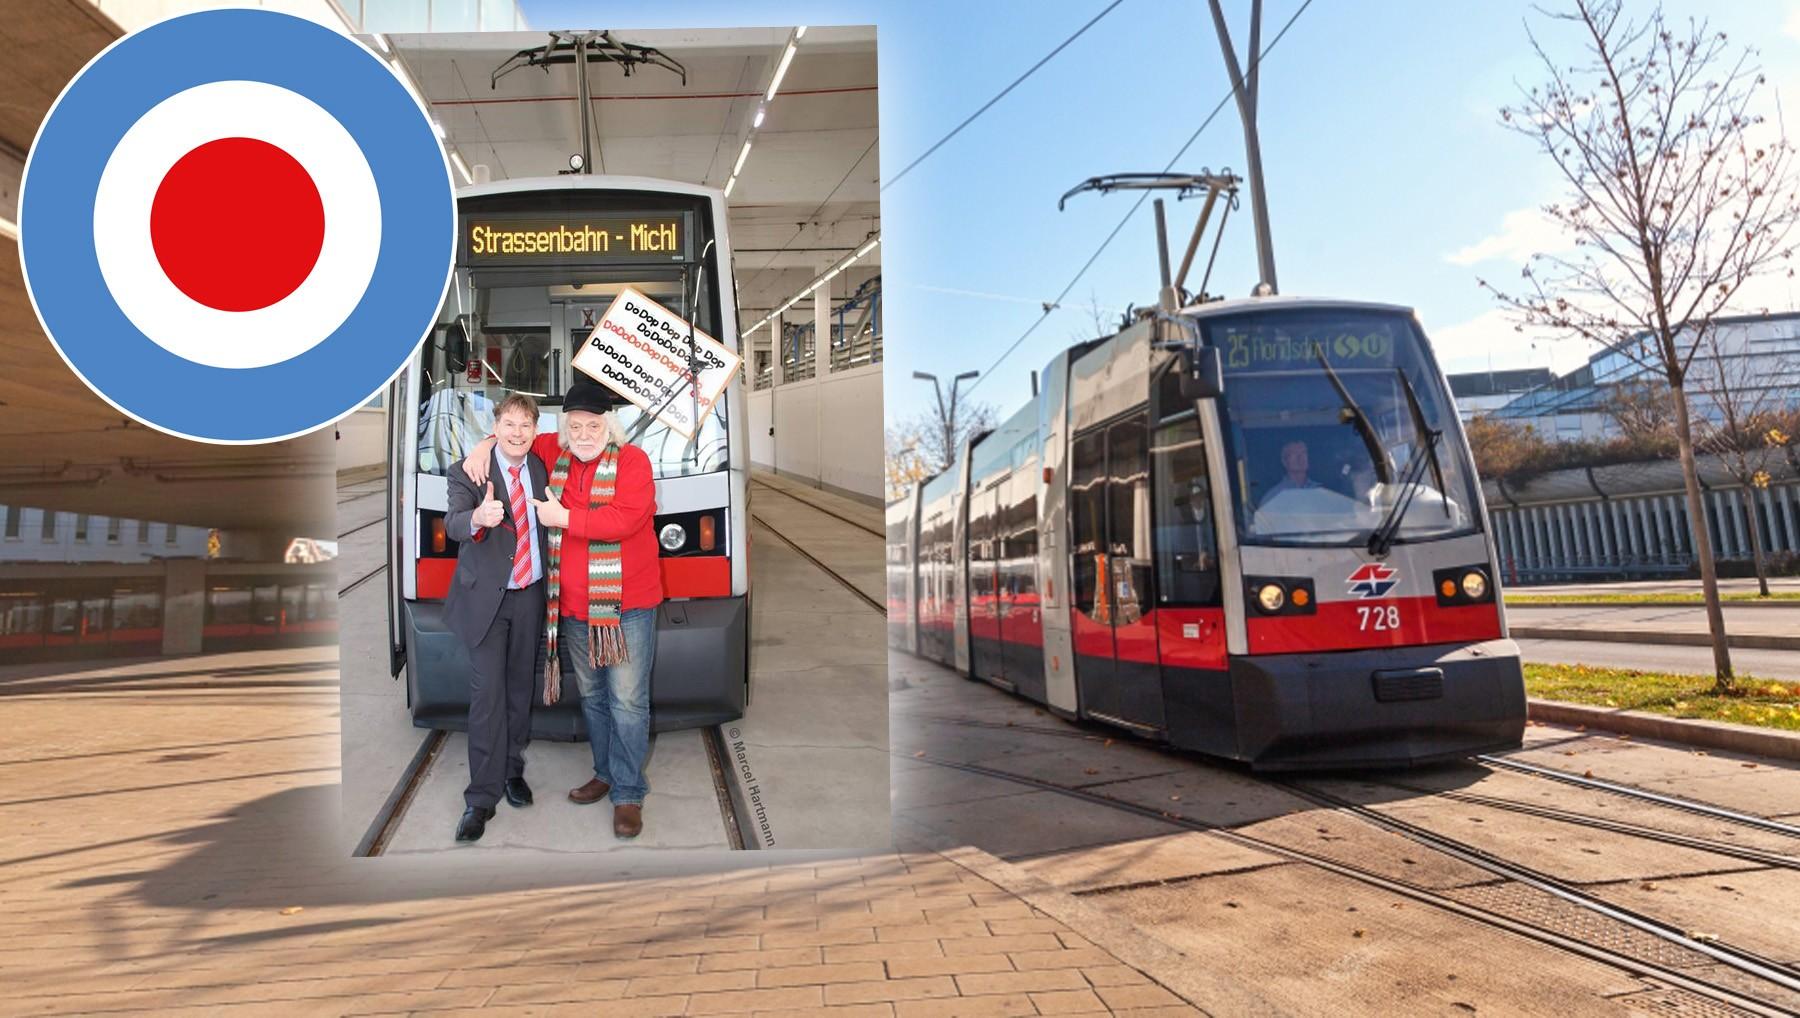 Wiener Bim Fahrer Startet Youtube Karriere City4u Kroneatcity4u